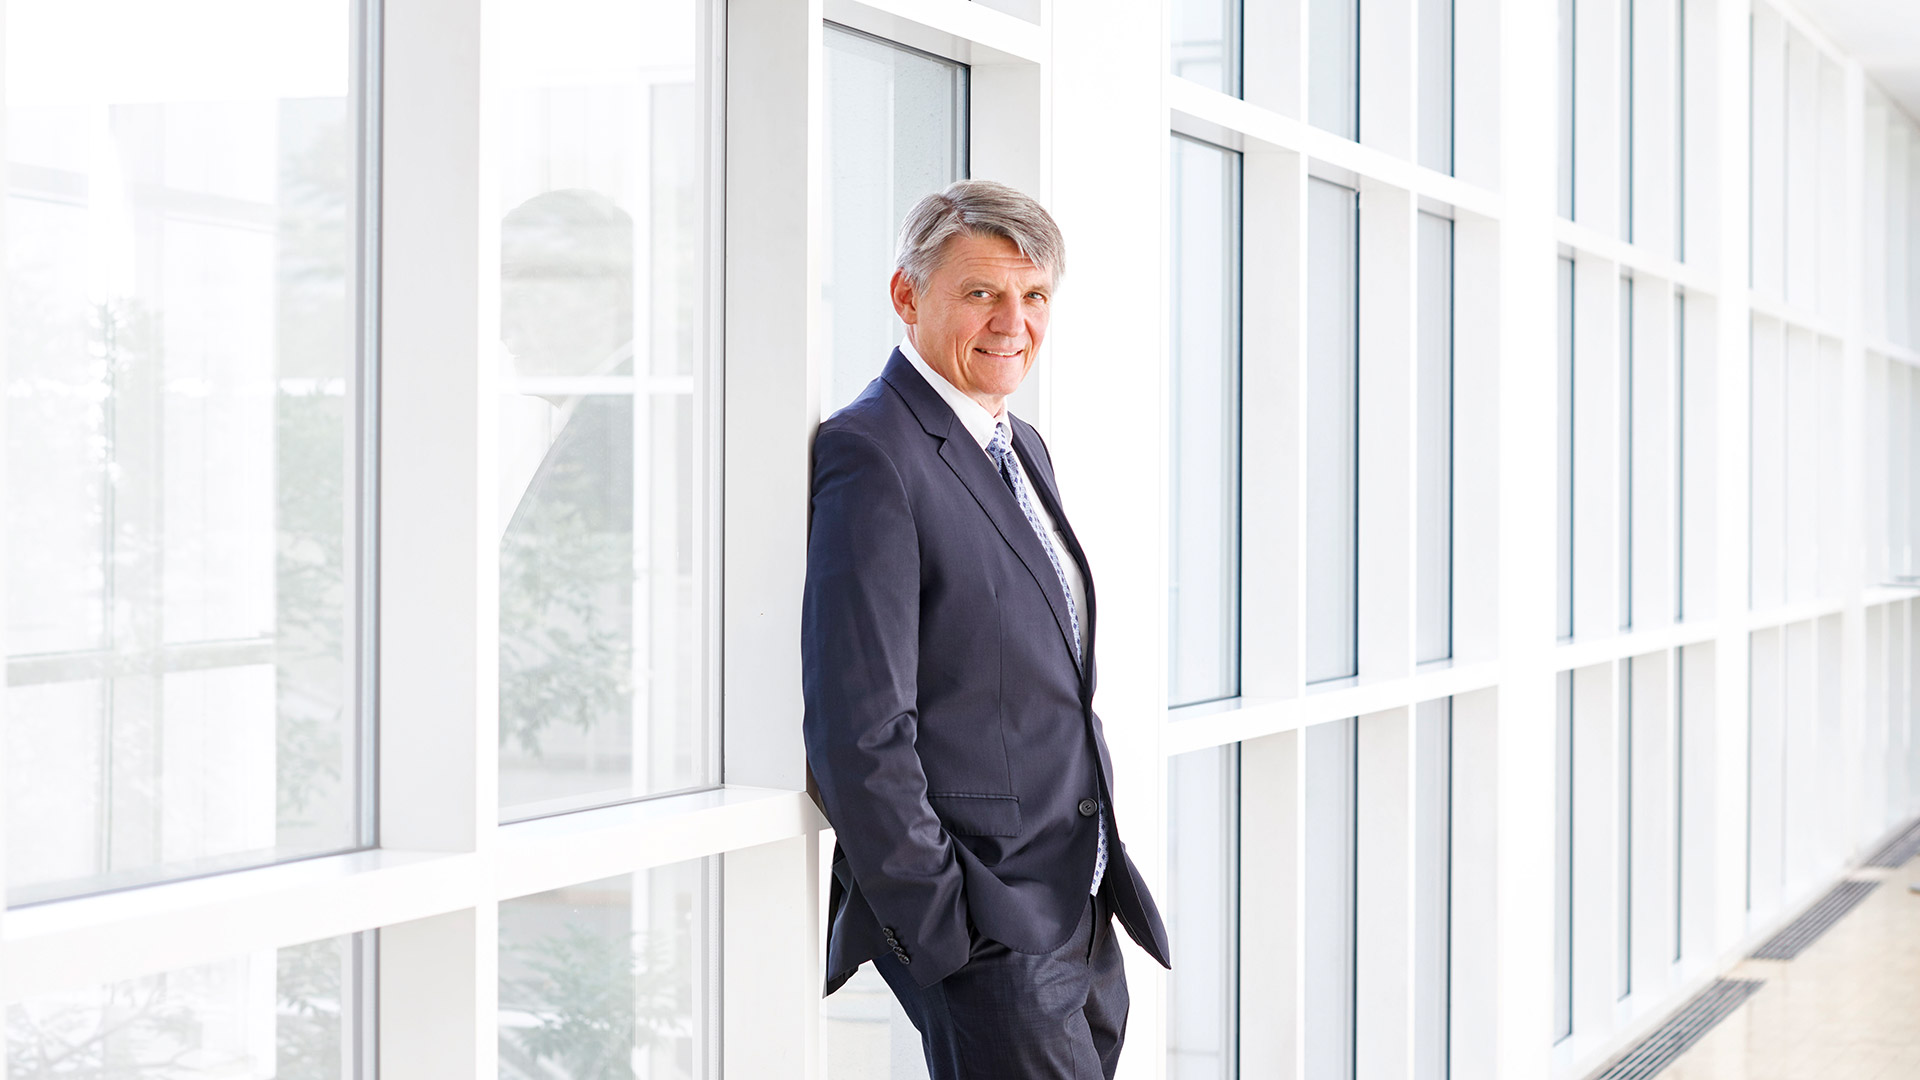 Martin Rivoir –Landtagsabgeordneter SPD, Wahlkreis Ulm/Alb-Donau –Foto, Start Slider